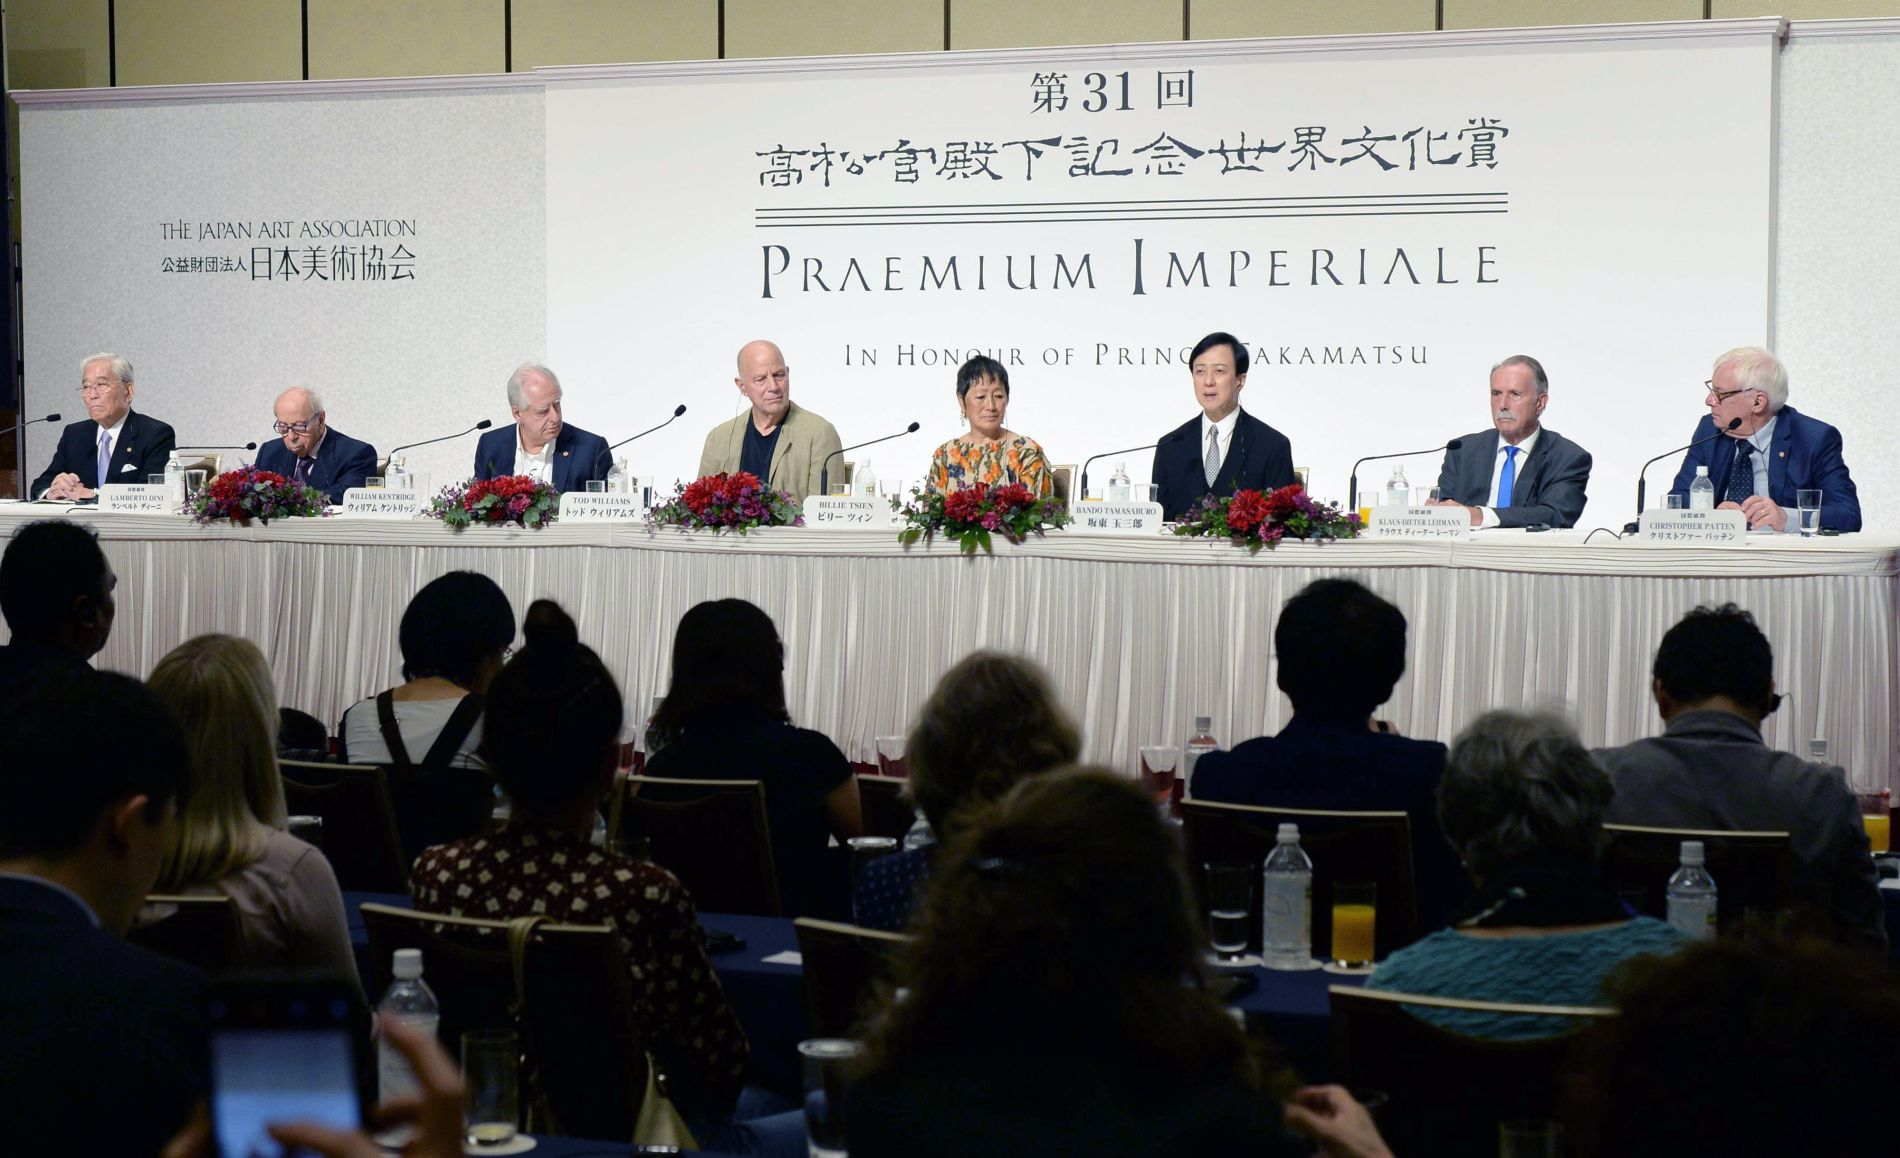 Japan Praemium Imperiale Awards 2019 Press Conference at Tokyo 017